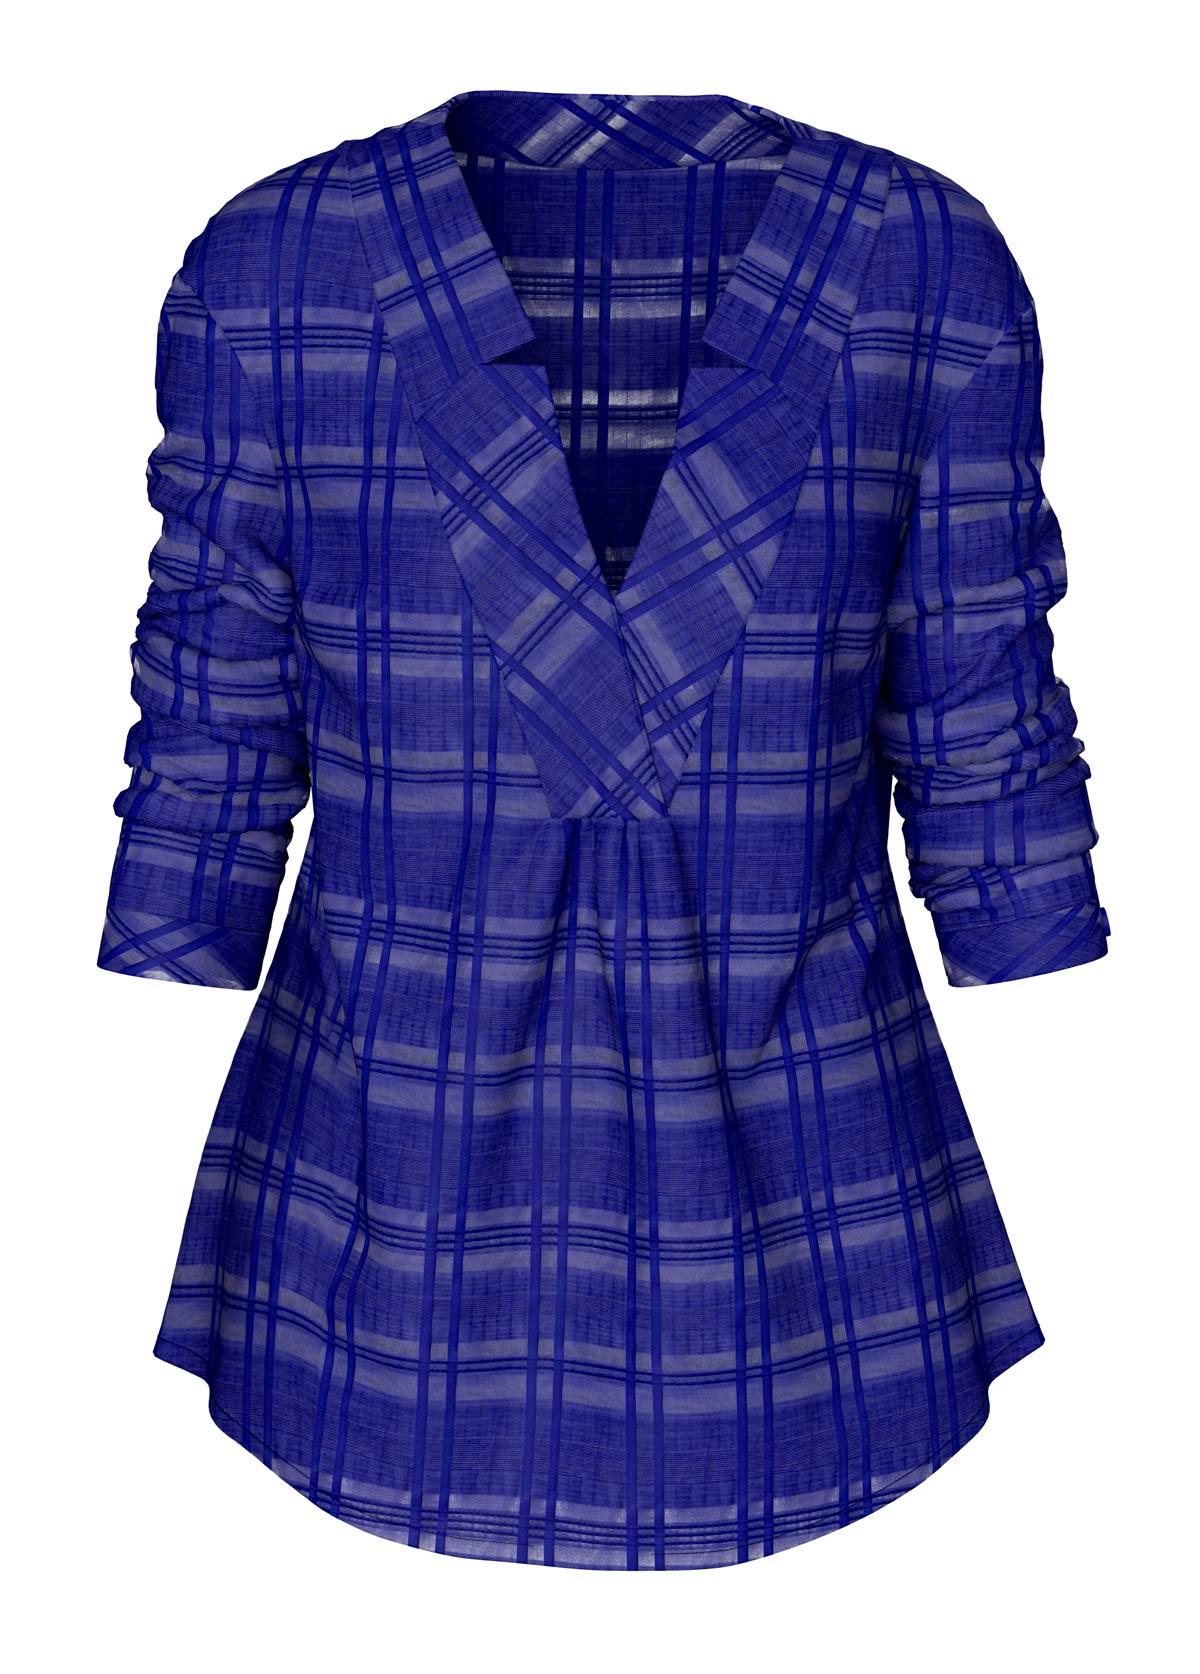 Long Sleeve Curved Hem Royal Blue Blouse